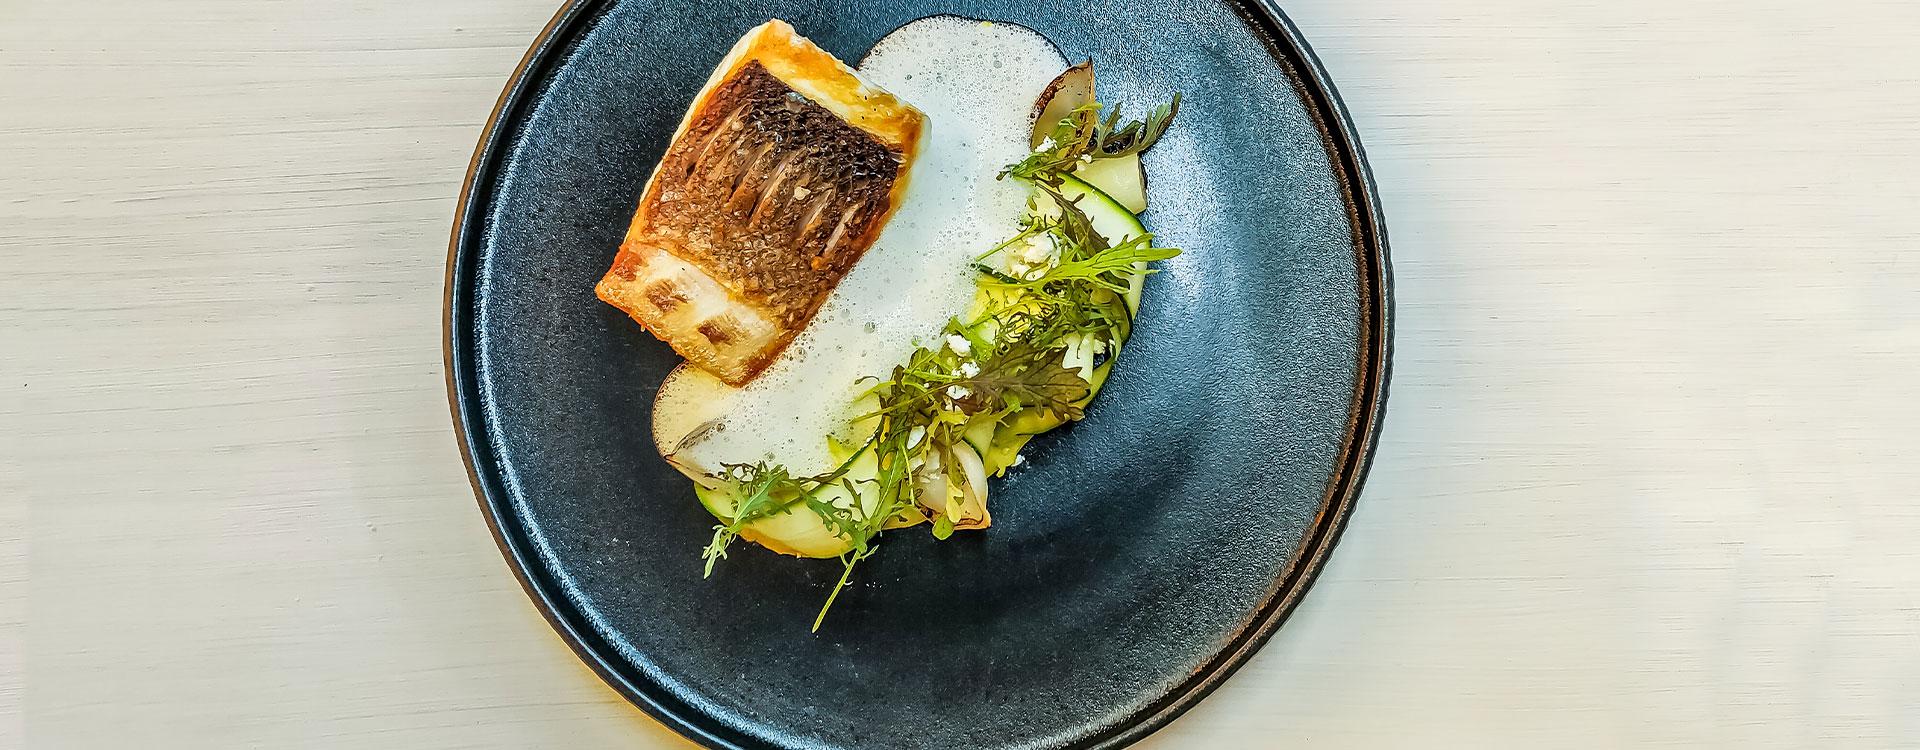 Amara Restaurant   Seared Sea Bass, served with Pistachio Cream, White Asparagus and Sparkling Wine Beurre Blanc